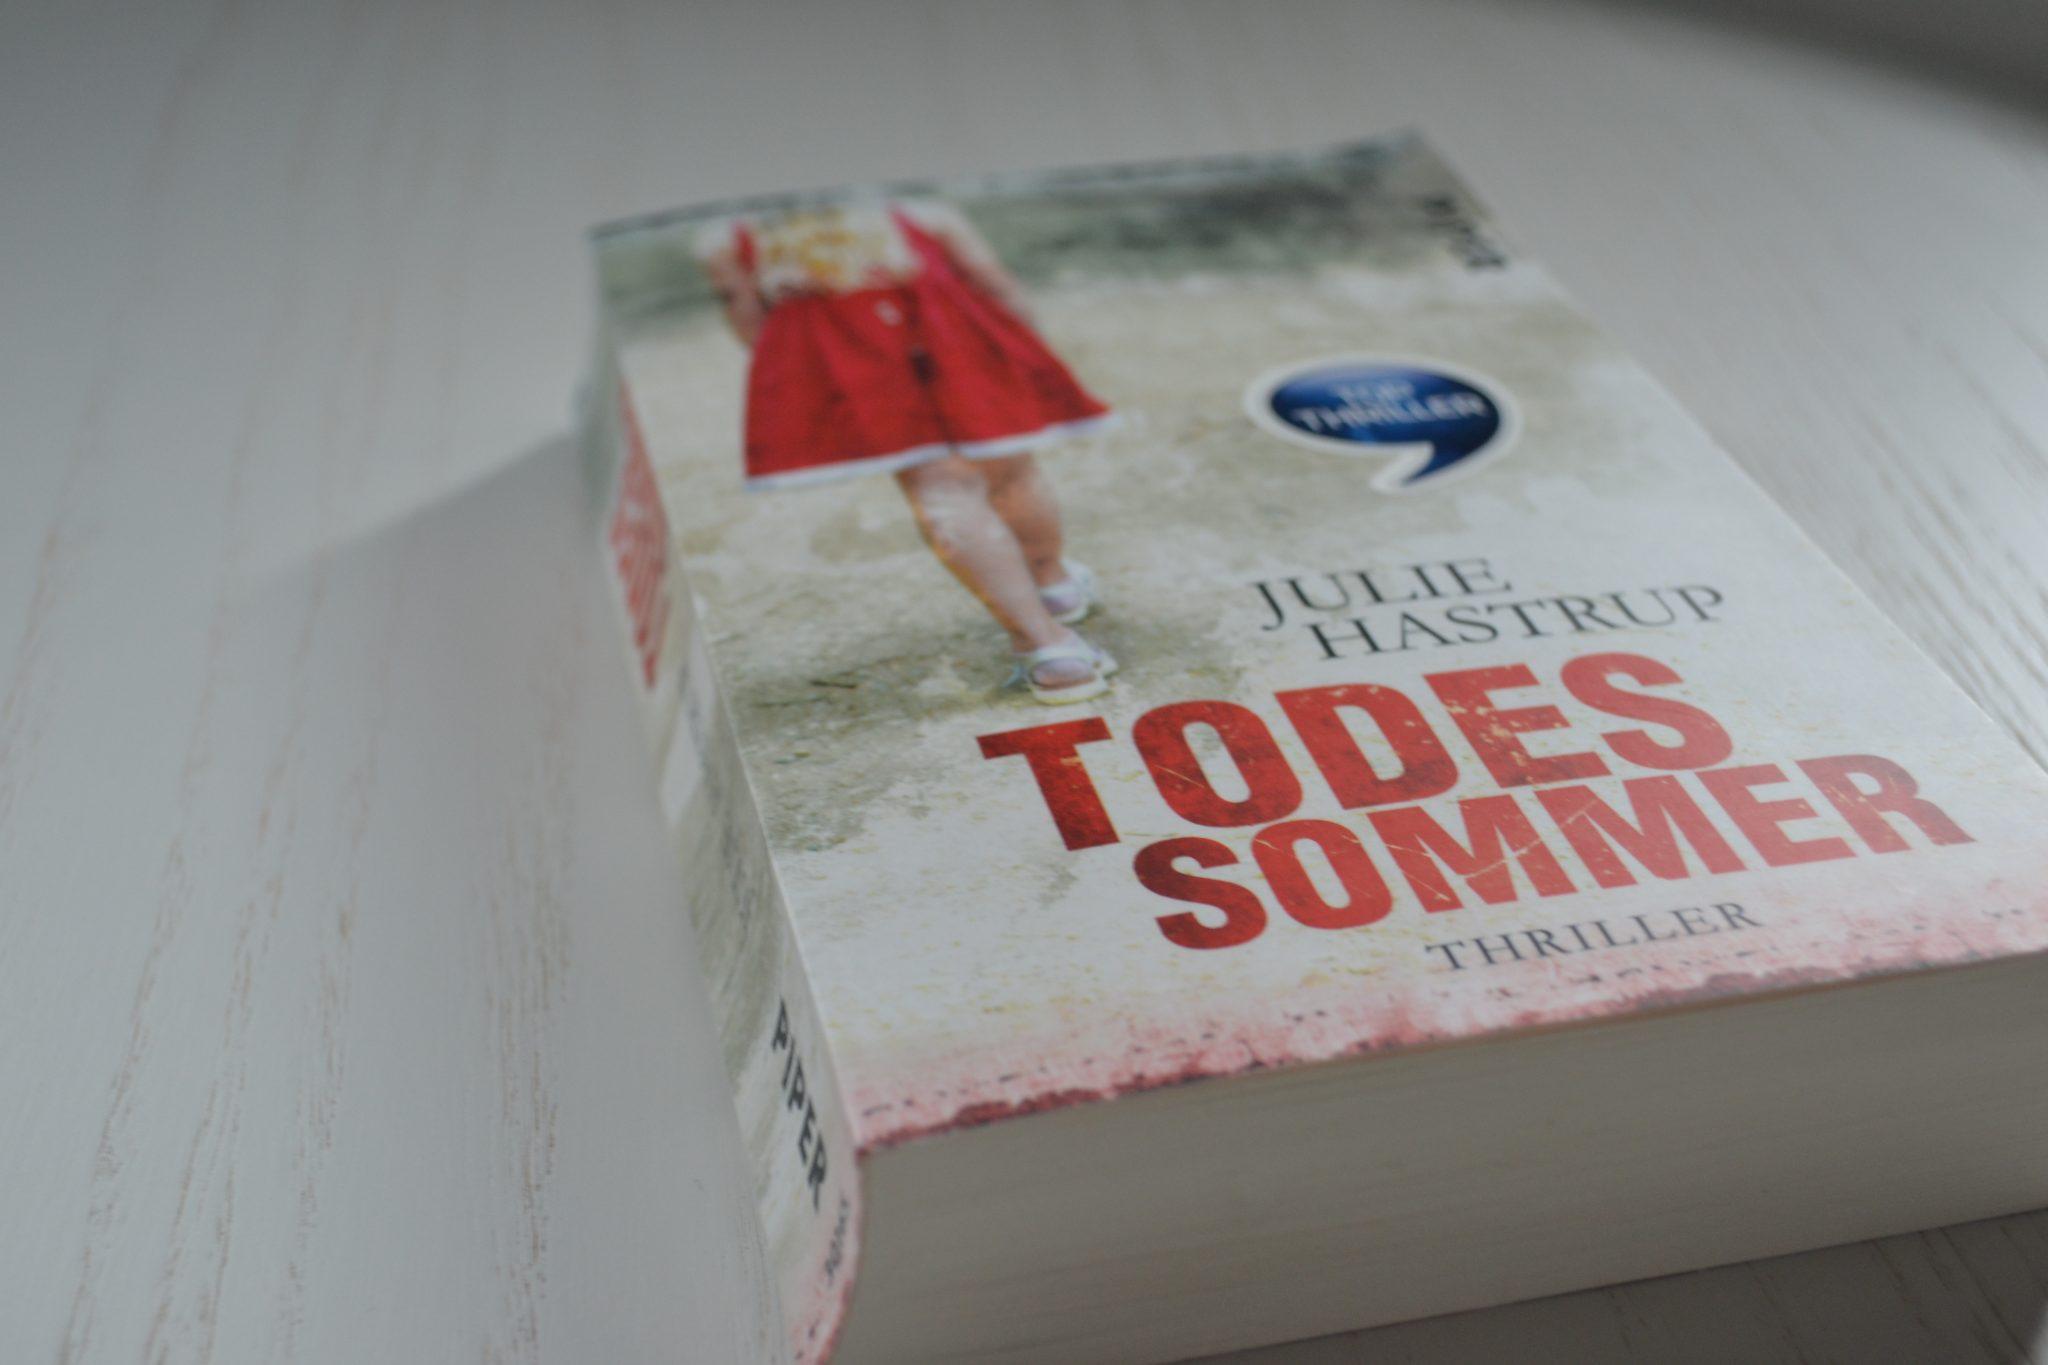 Books: Todessommer | Julie Hastrup - DSC 0072